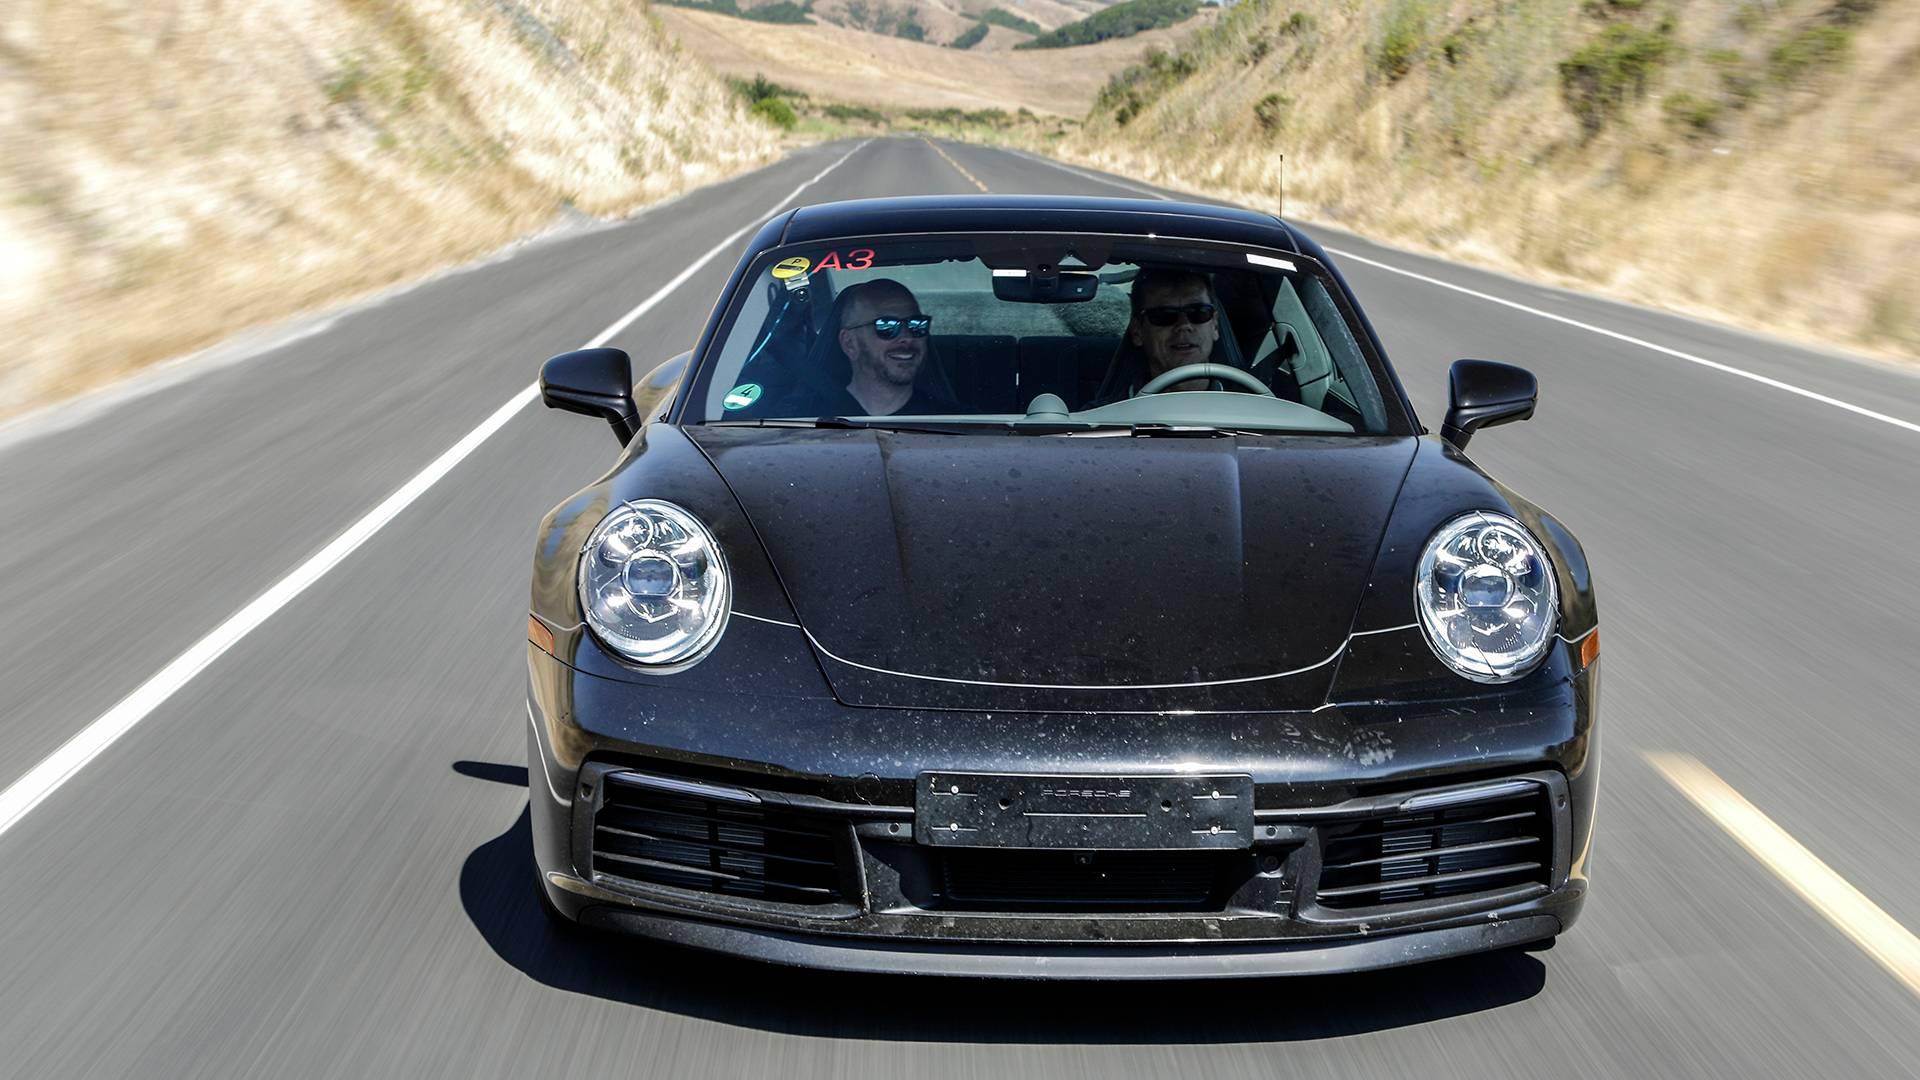 2020-porsche-911-carrera-s-prototype-5